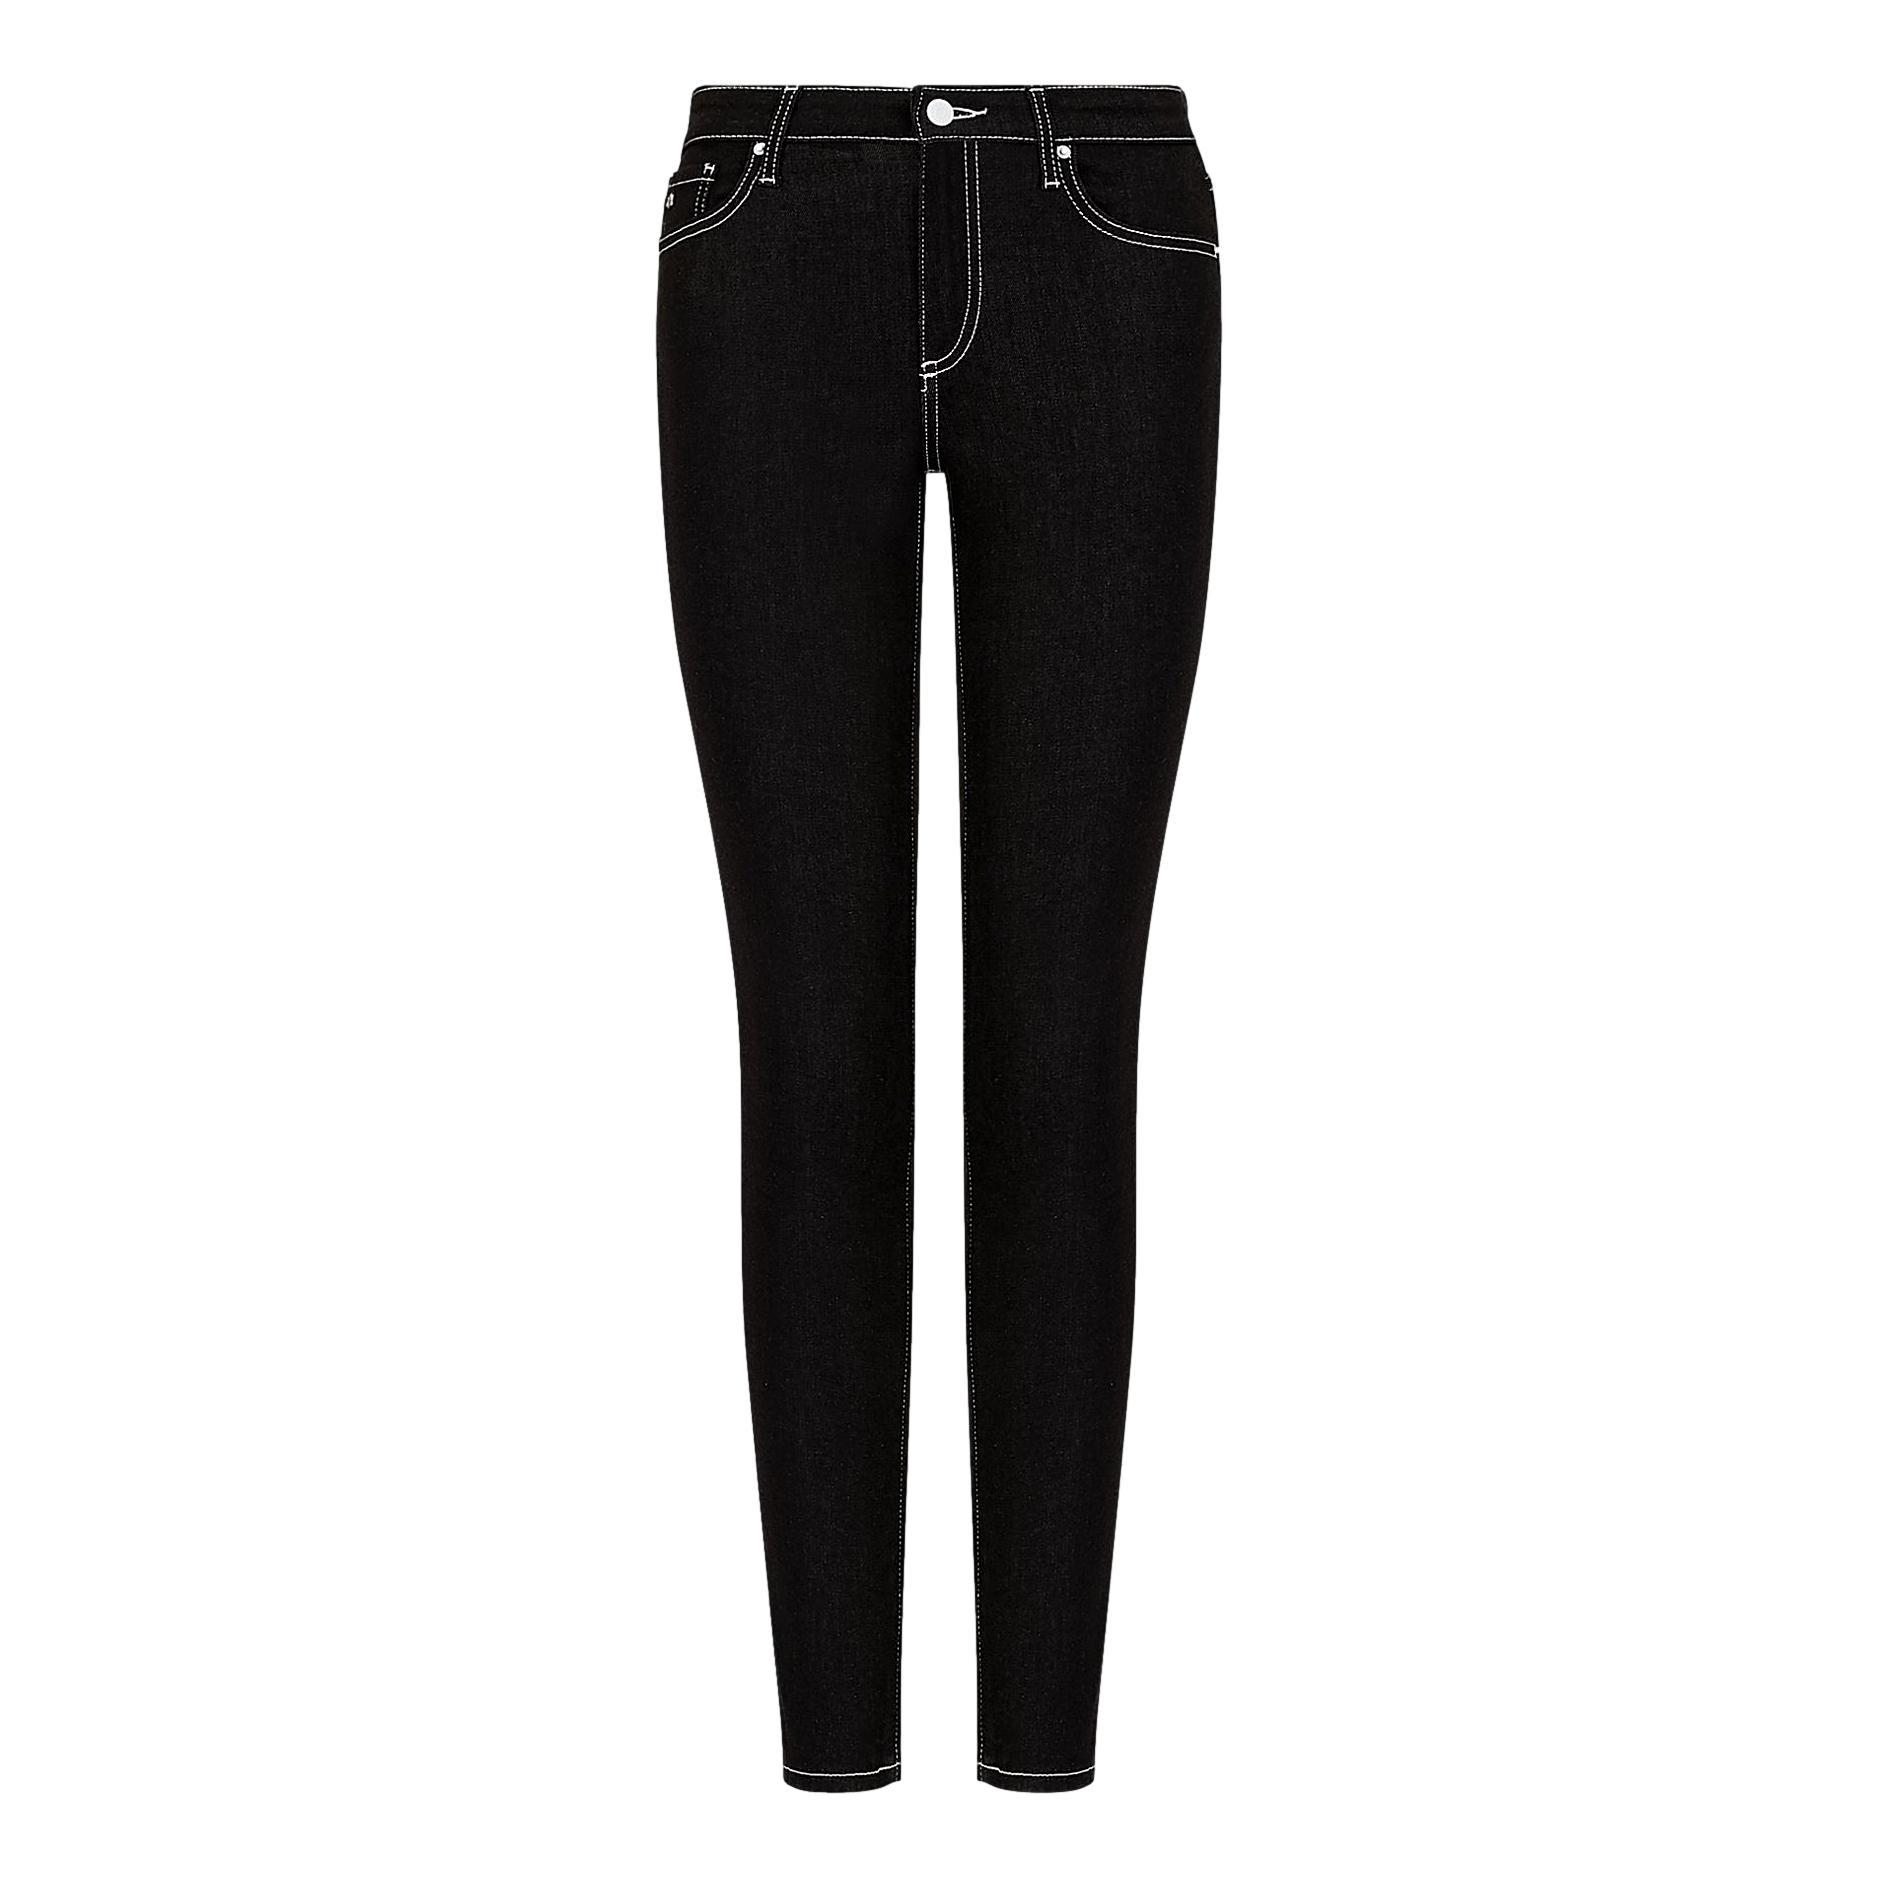 Five pockets in super skinny J01 ultra-stretch denim ARMANI EXCHANGE |  | 6KYJ01 Y1EPZ0204